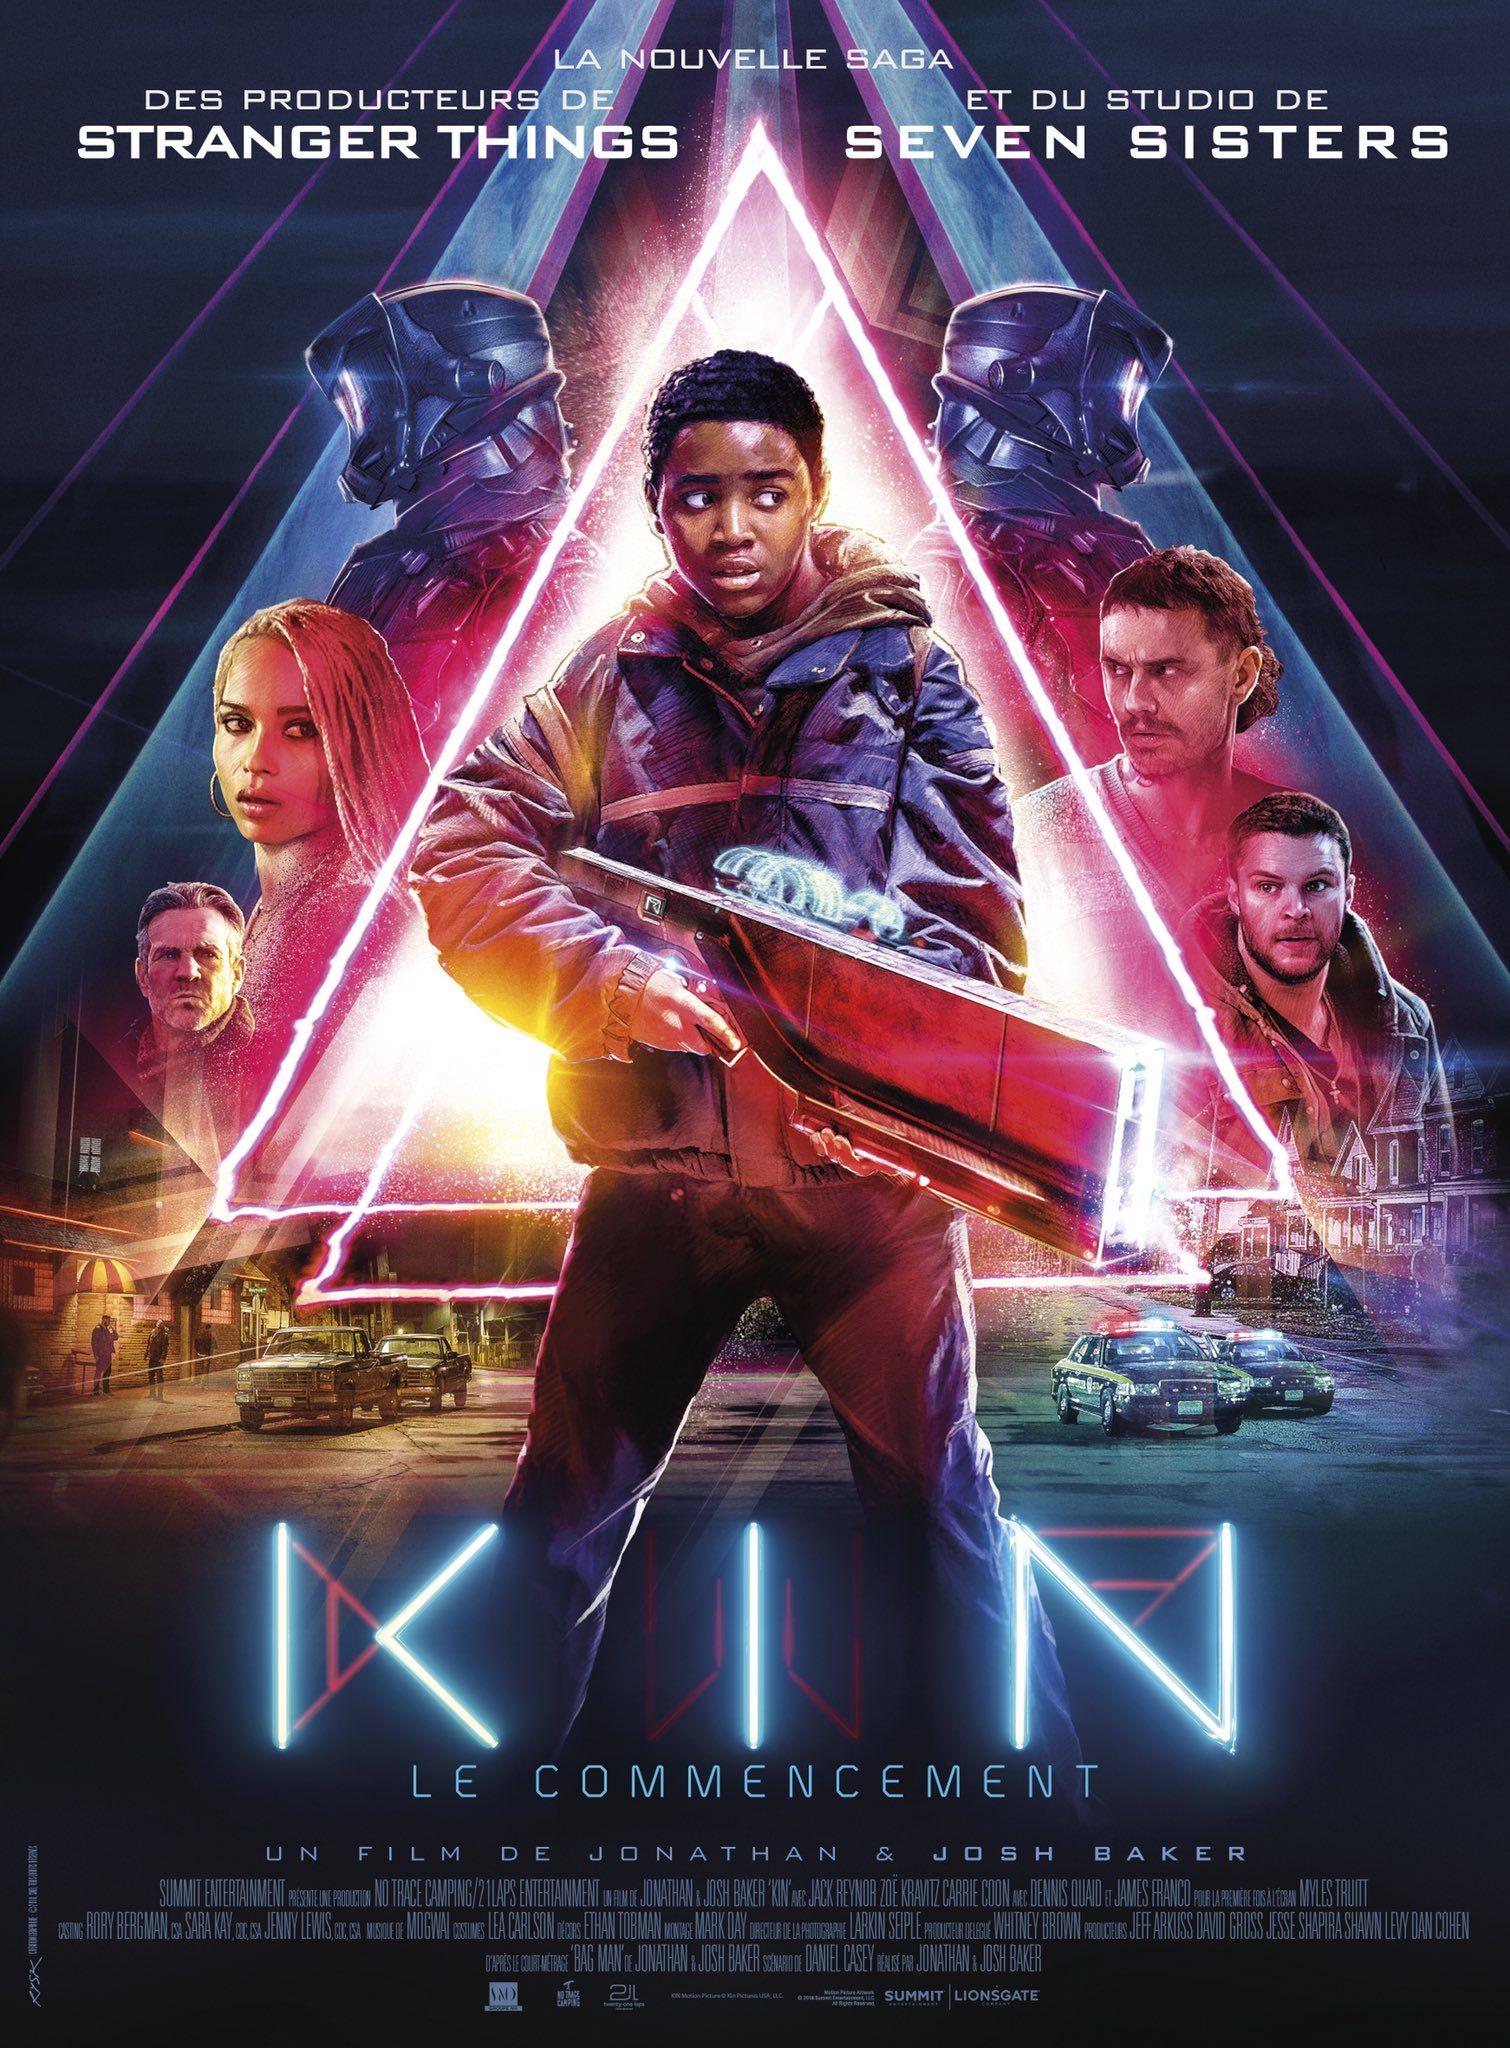 Kin 2018 1510 X 2048 Filmes Baixar Filmes Cartazes De Cinema